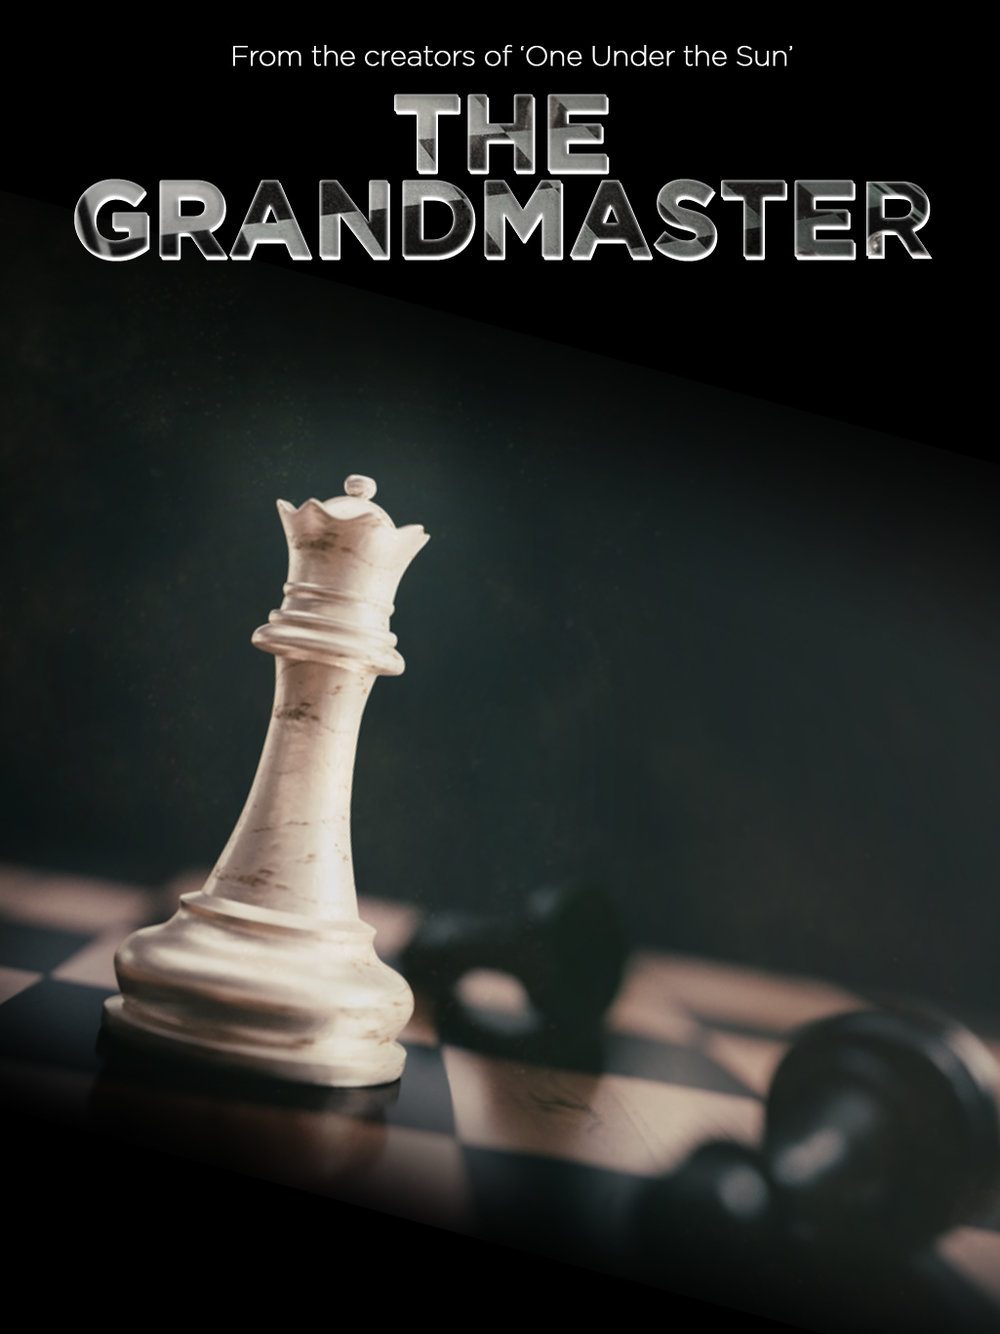 The Grandmaster (2018) - Coming Soon